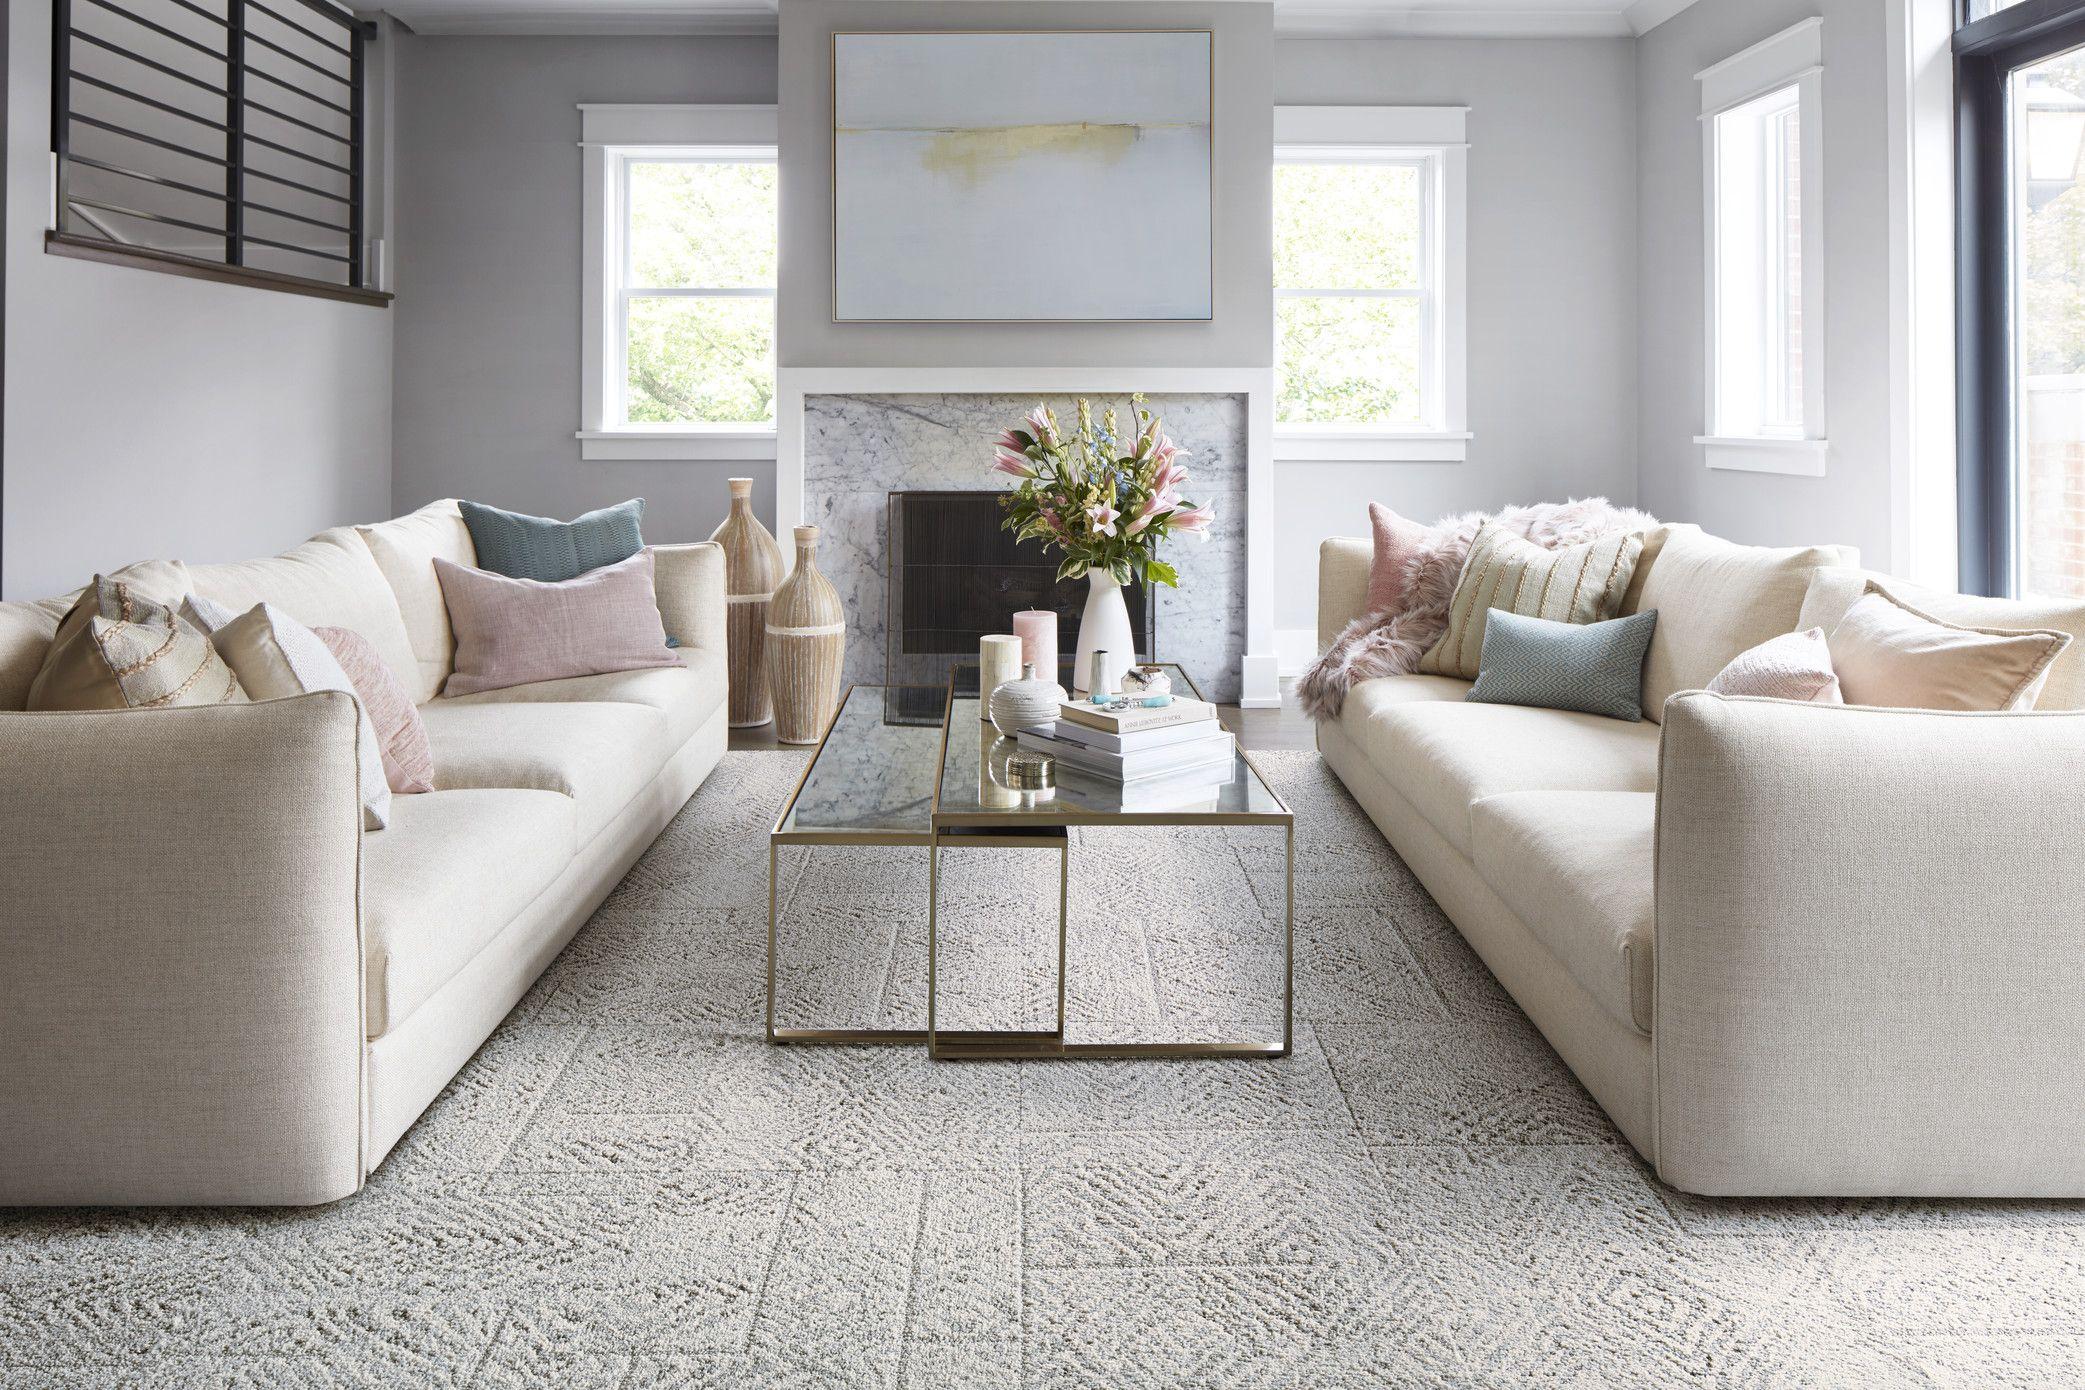 Pin On Living Room Inspiration Flor